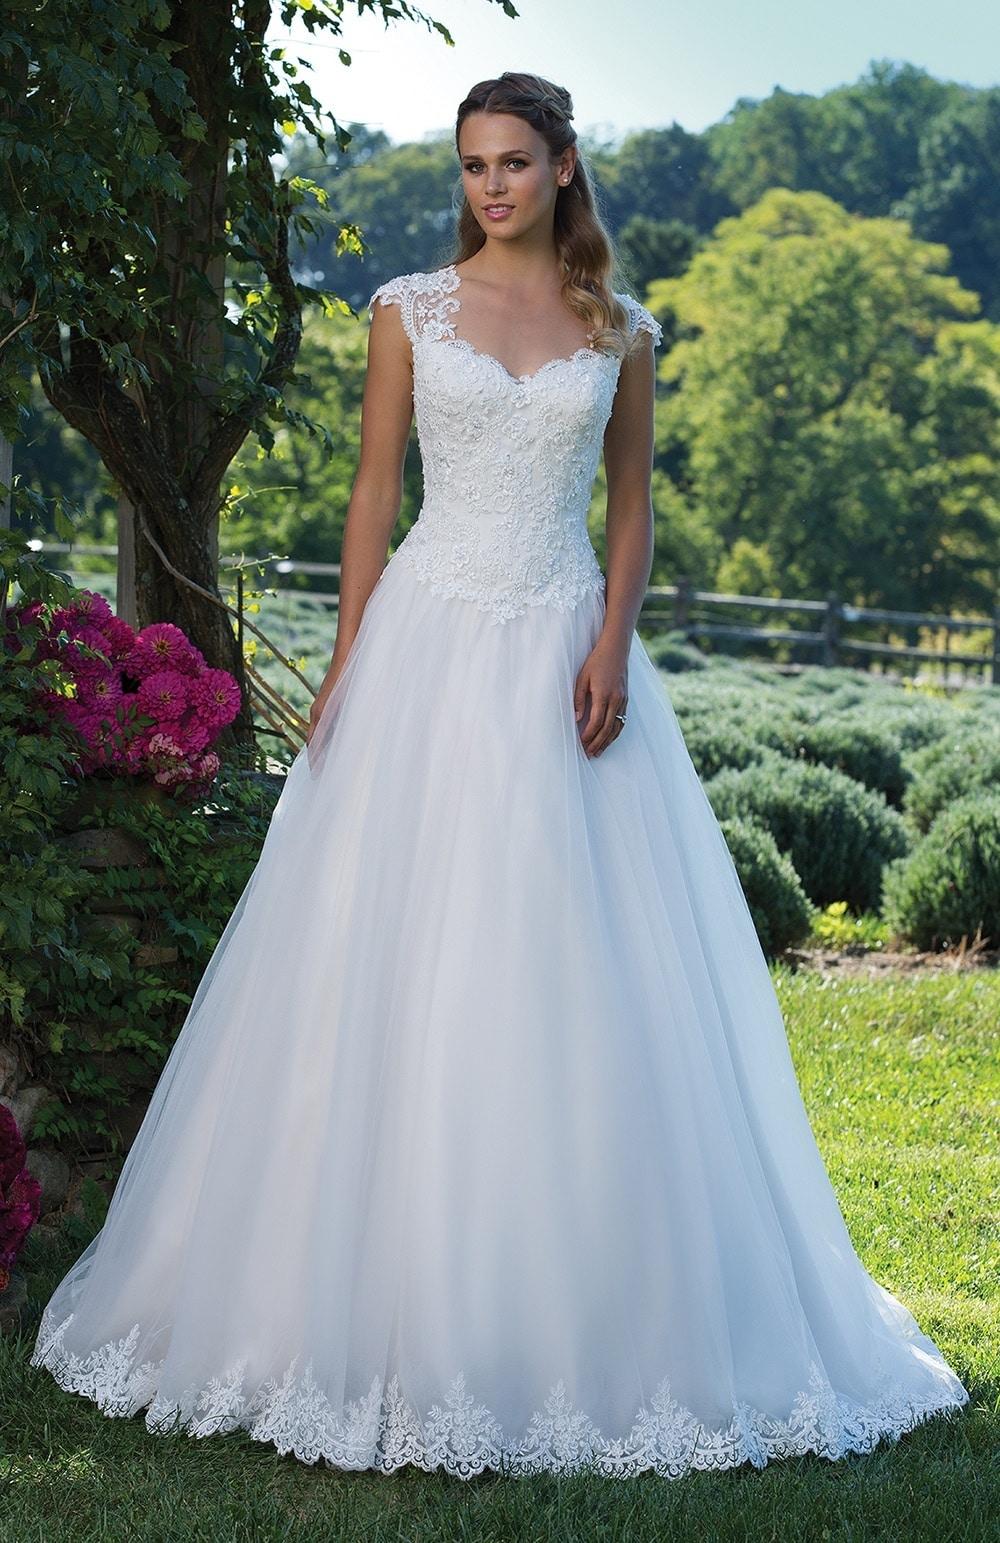 Robe de mariée Modèle Sacha – 3982